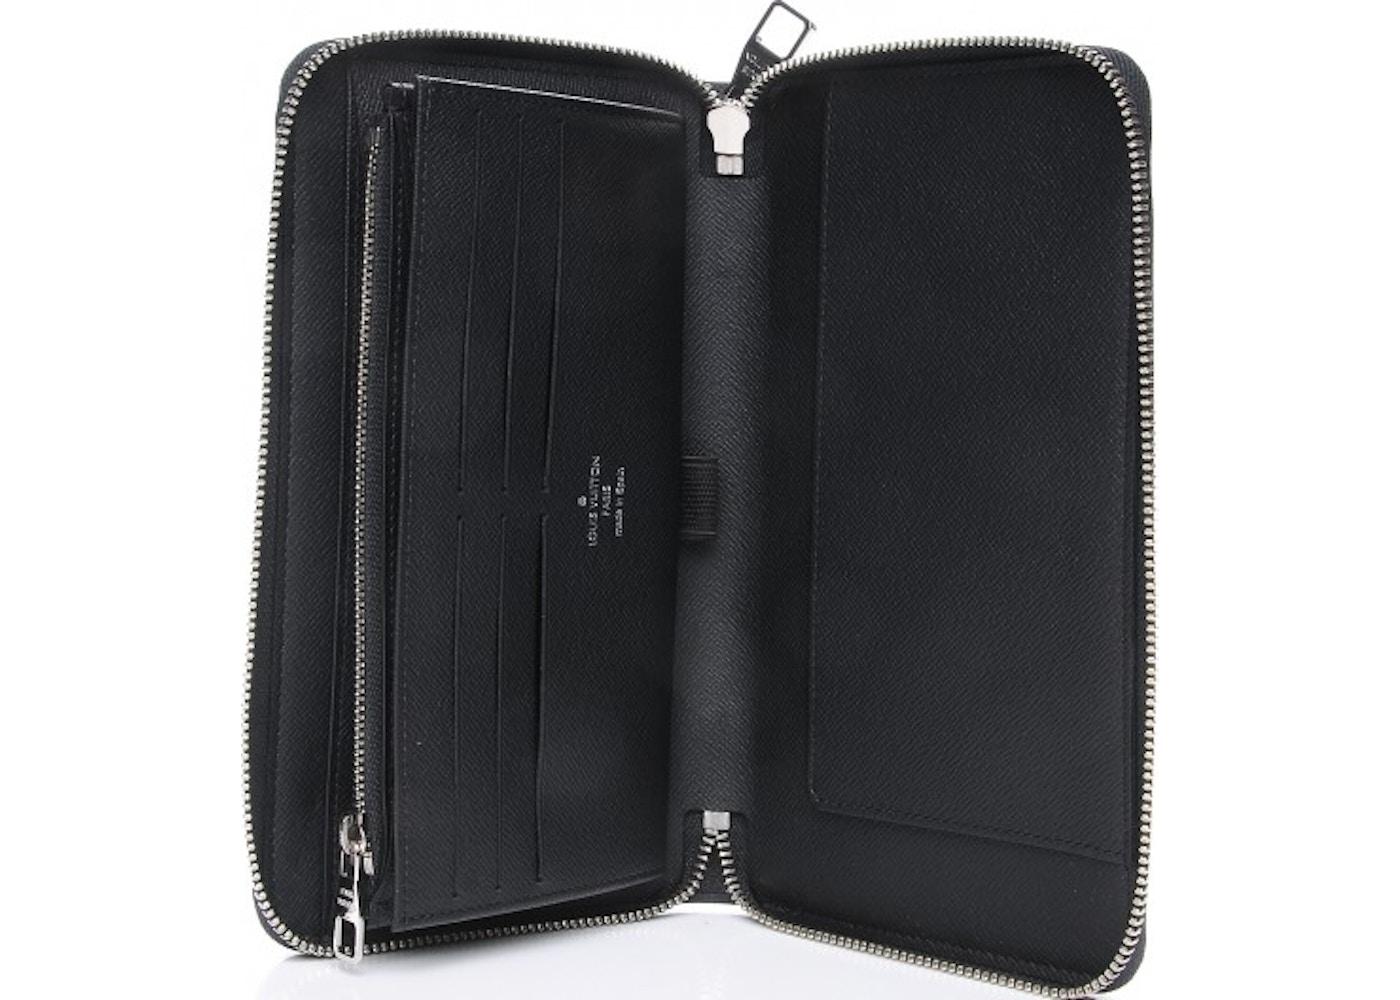 527ee940e5 Louis Vuitton Wallet Zippy Organizer Damier Graphite